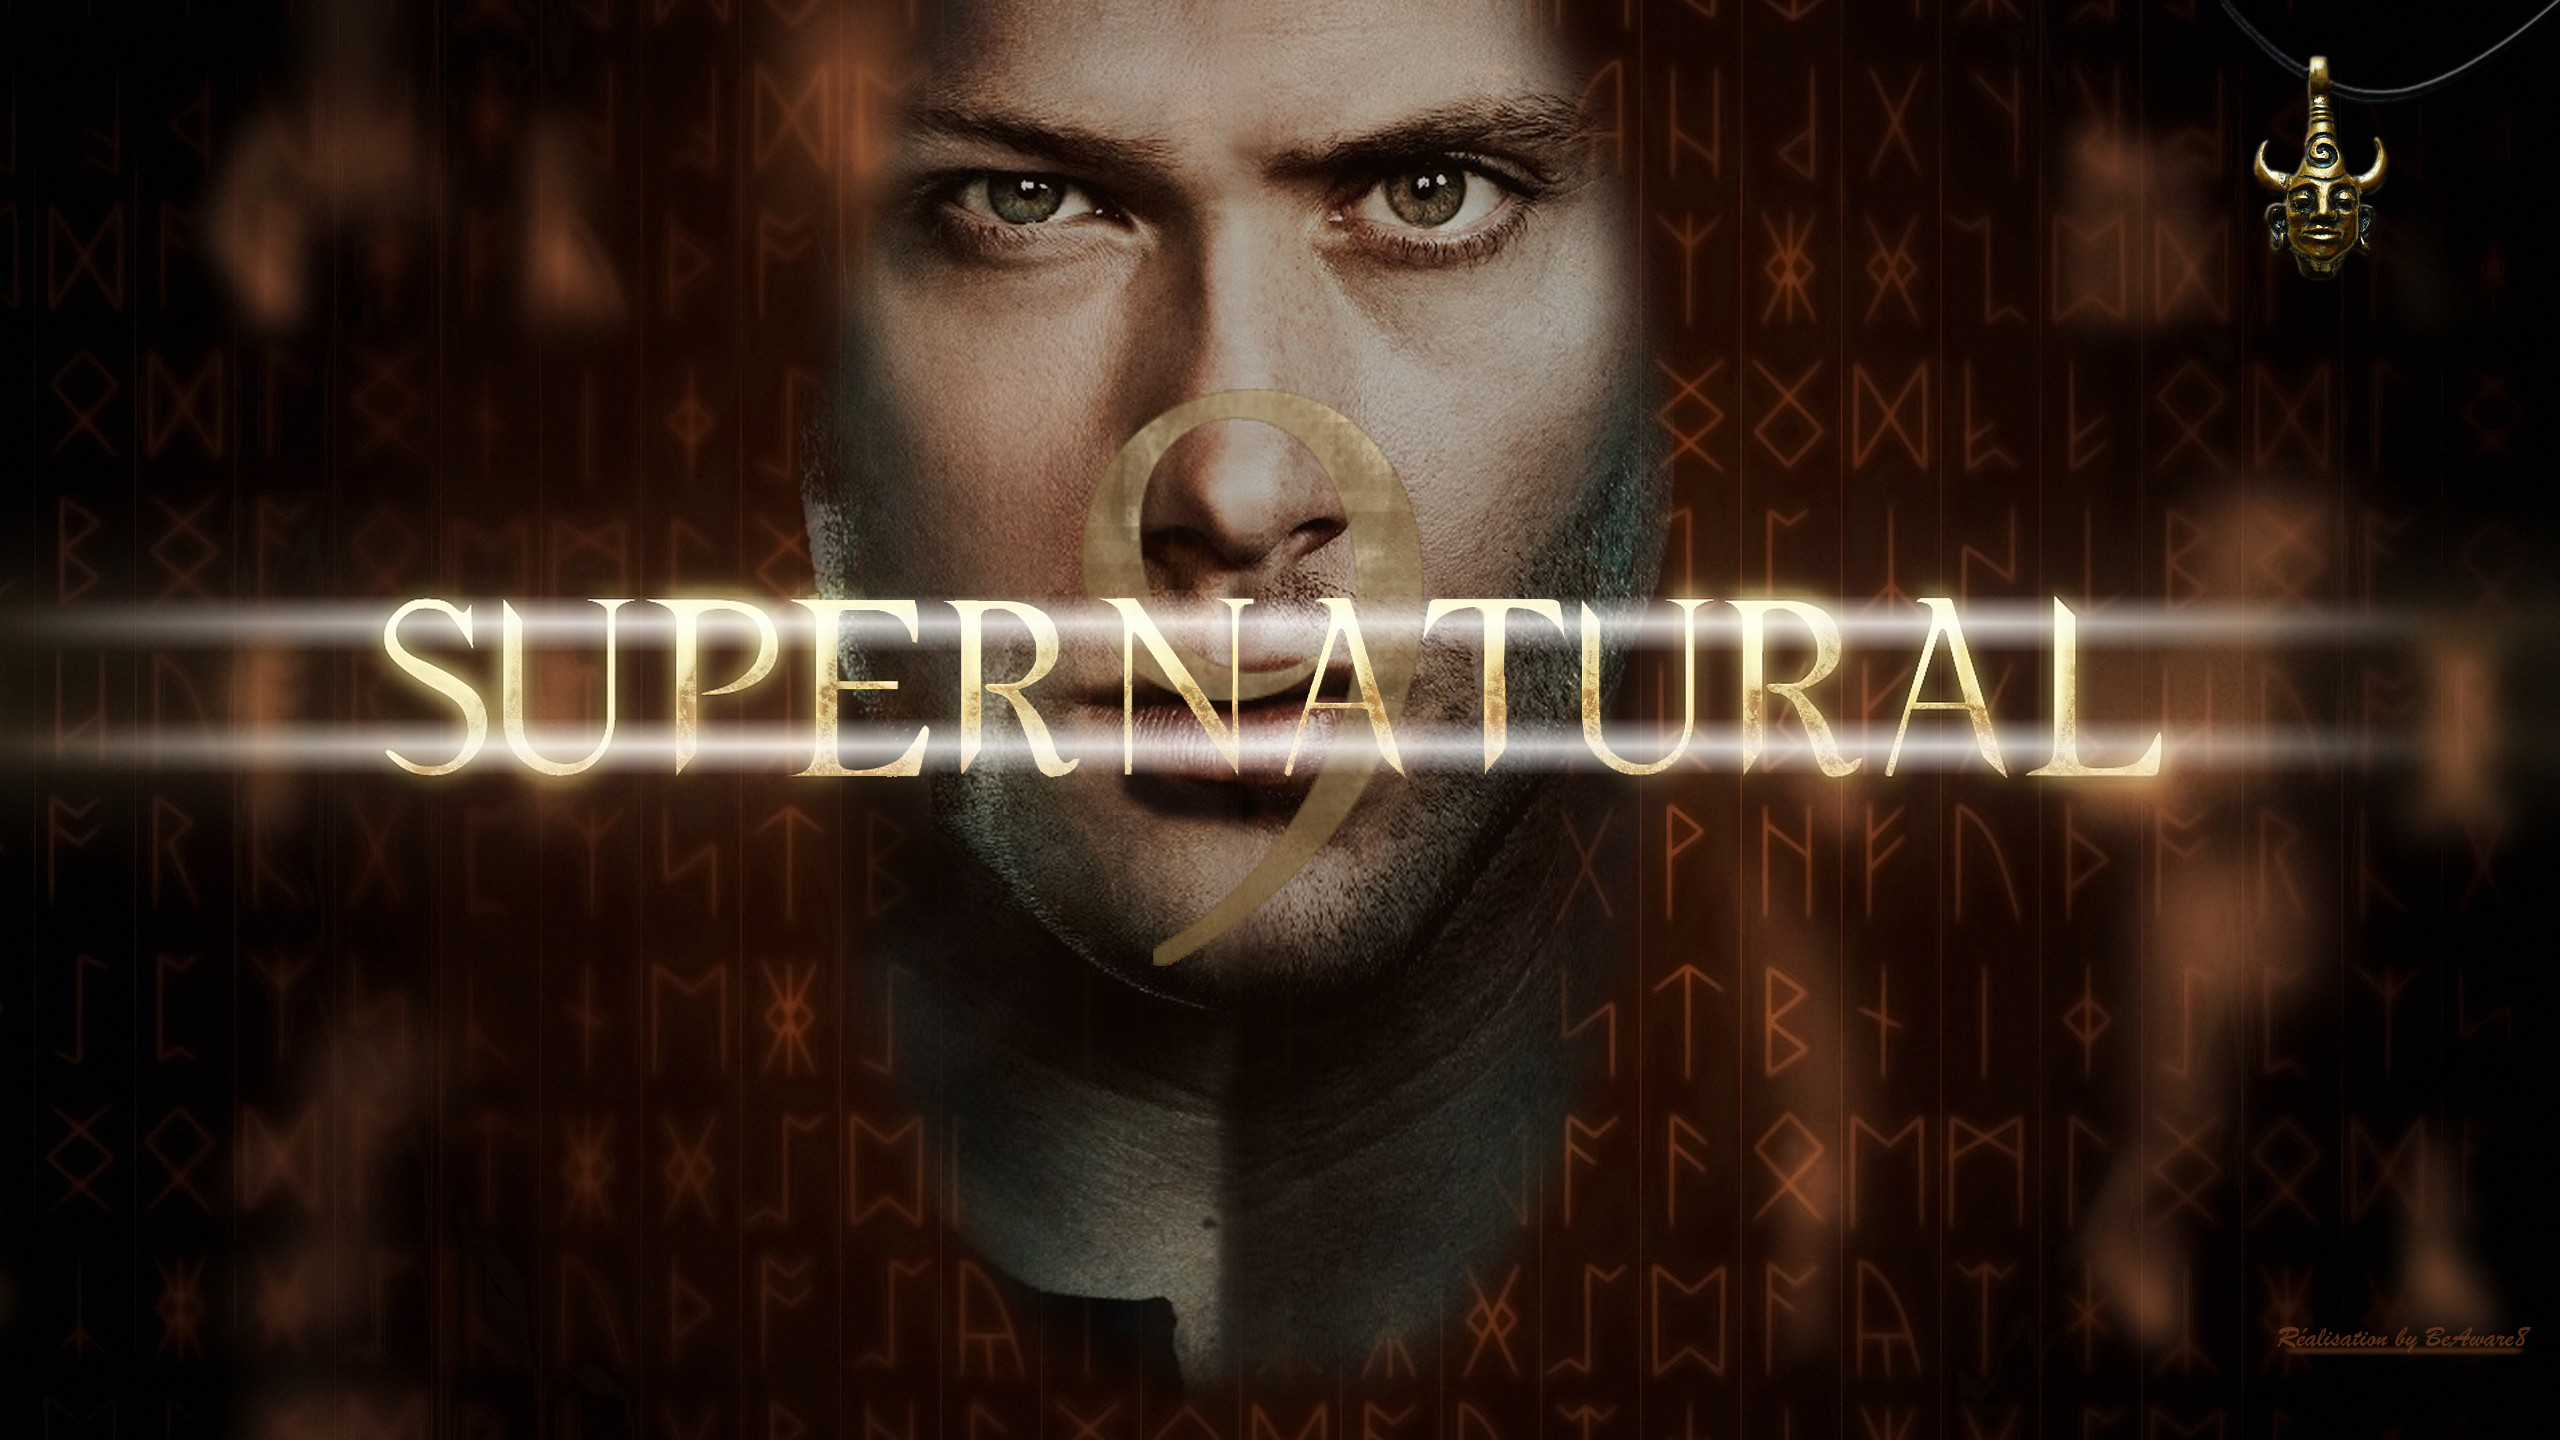 supernatural, face, wallpaper, art, beaware8, sam, d7nbzzs